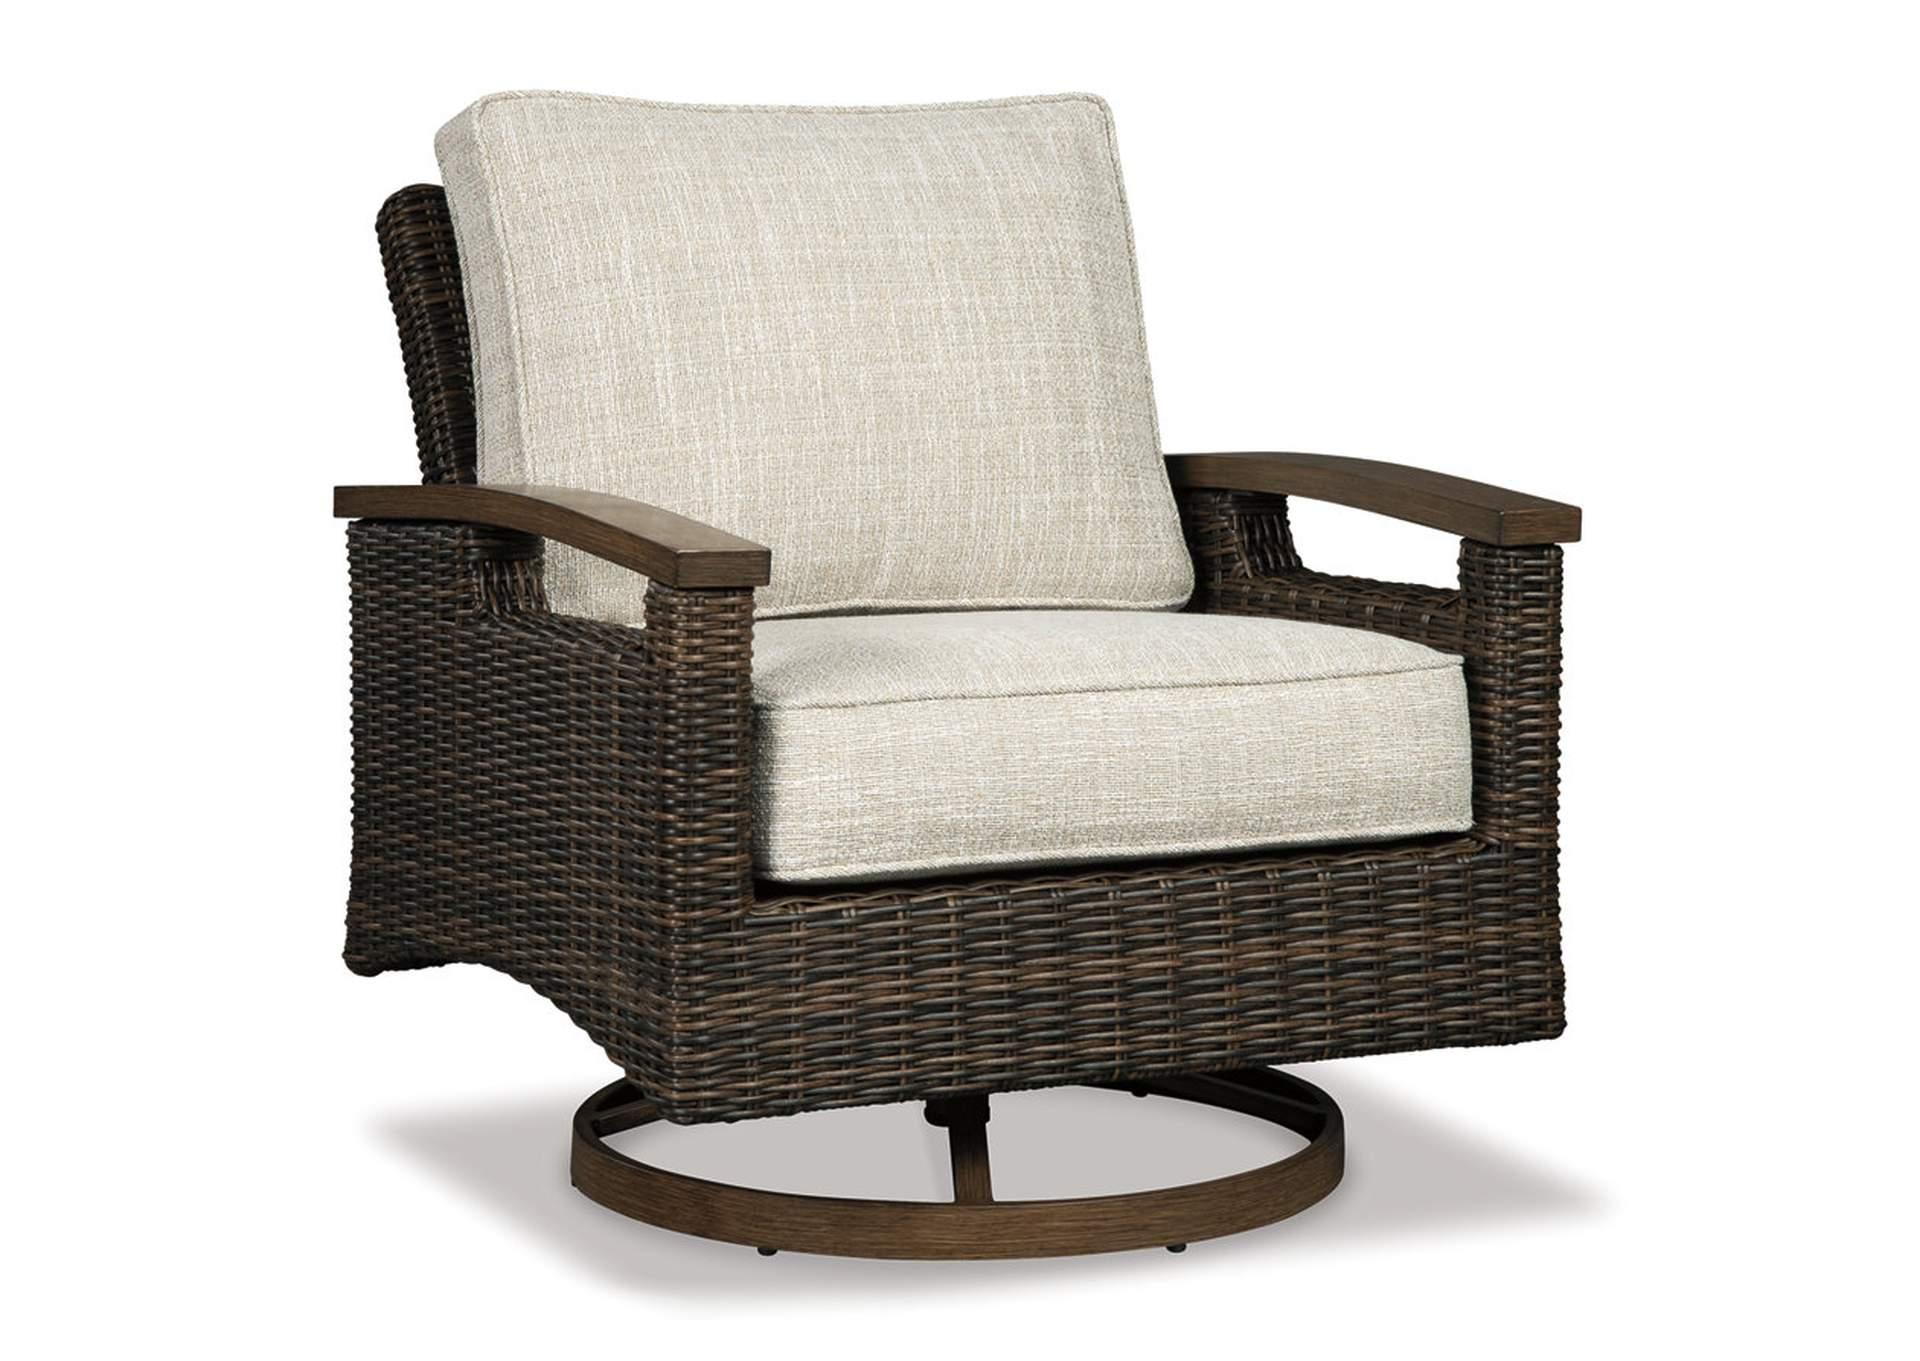 Surprising Furniture Mart Usa Discount Ashley Furniture Store Download Free Architecture Designs Crovemadebymaigaardcom